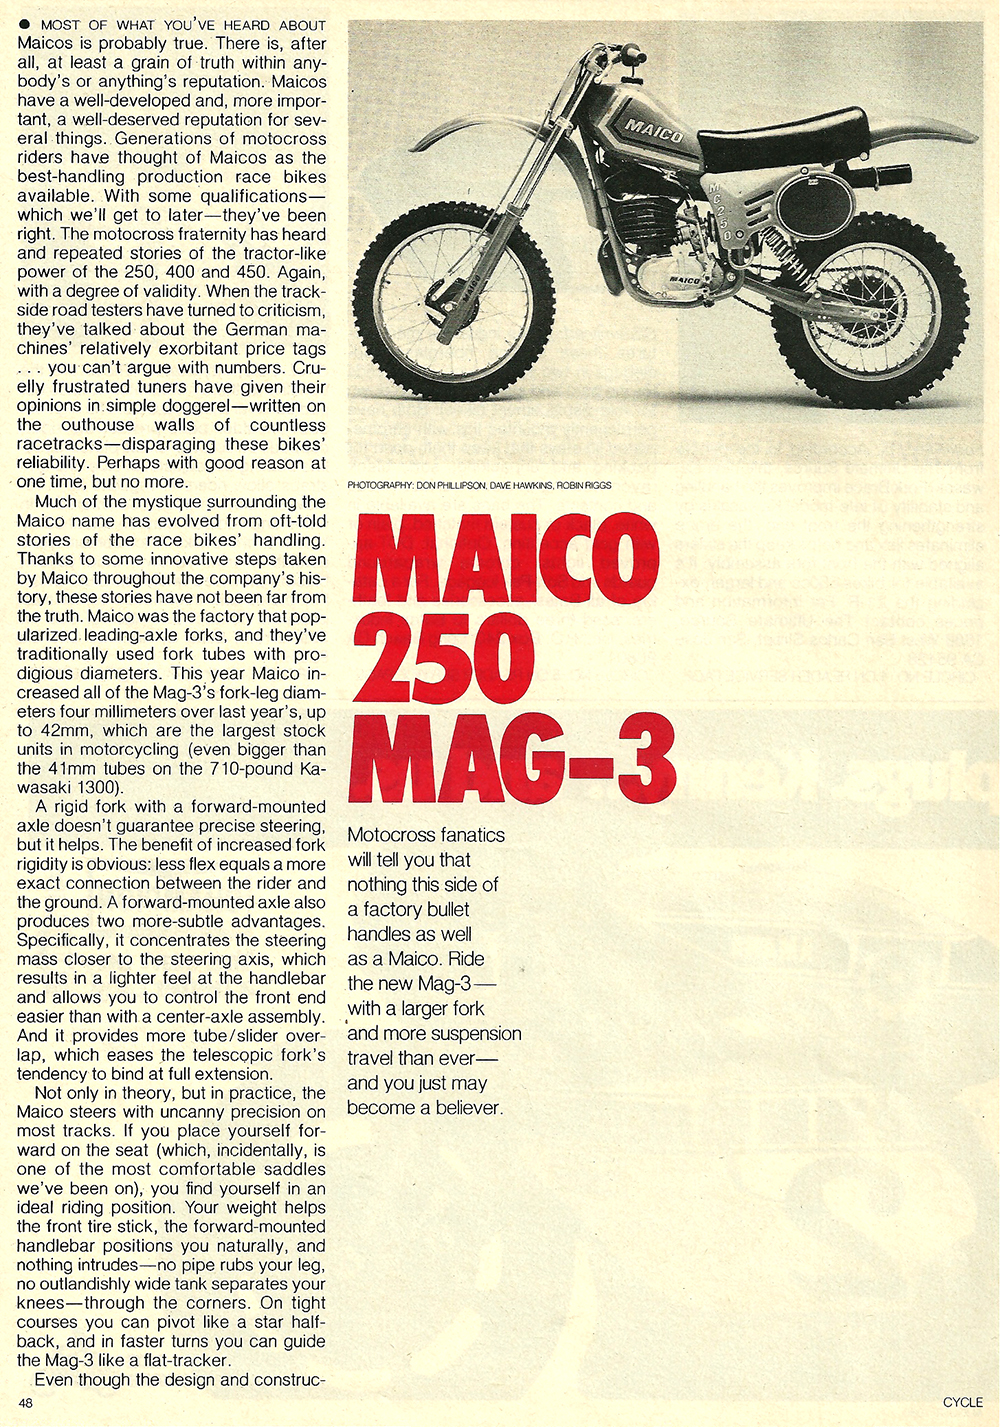 1980 Maico 250 Mag-3 road test 1.jpg